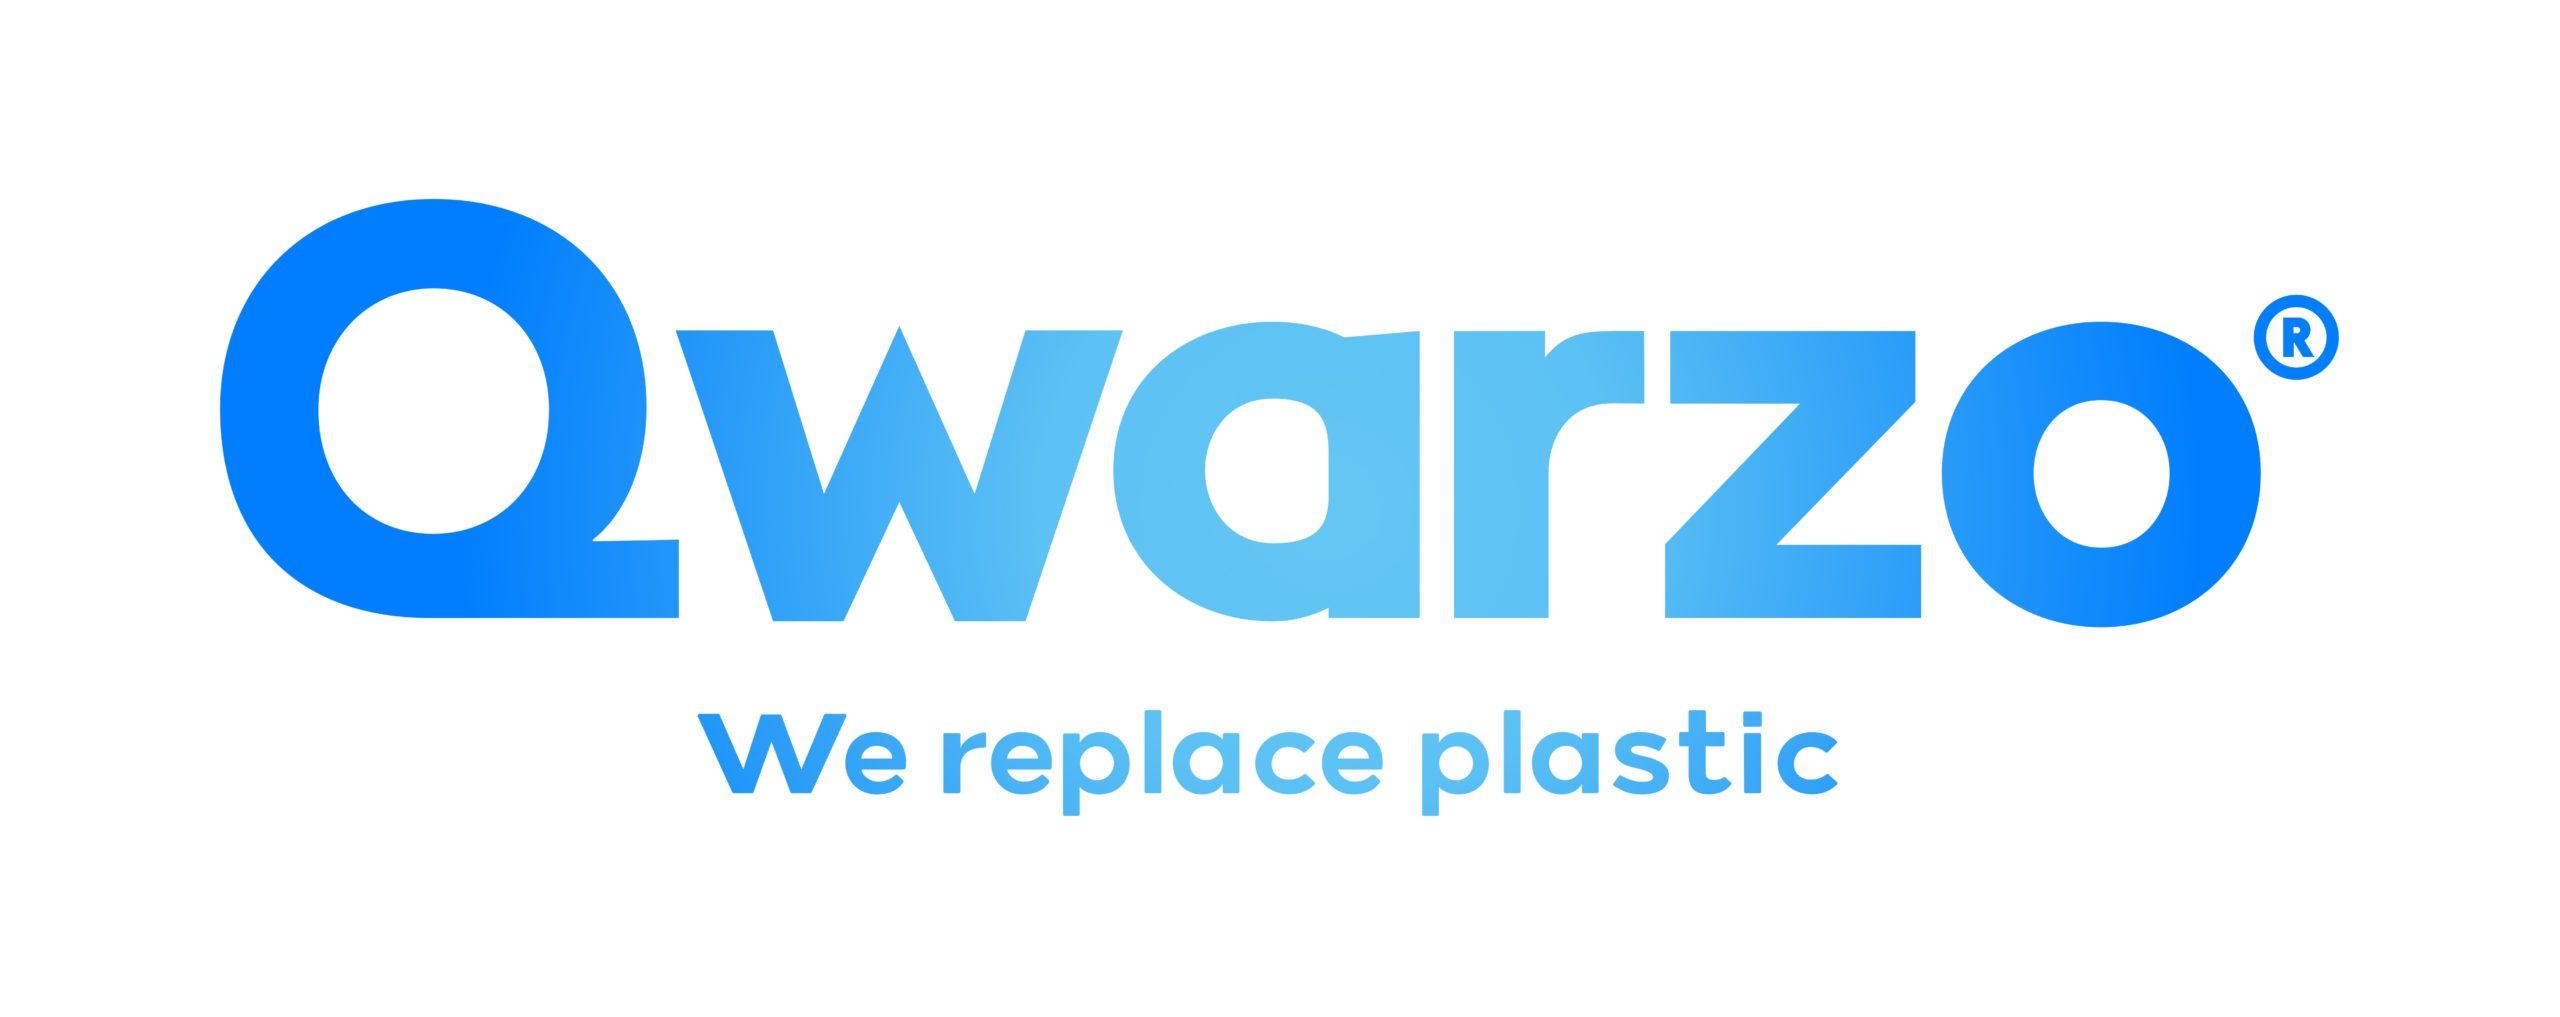 https://europeanplasticspact.org/wp-content/uploads/2020/03/Qwarzo-scaled.jpg